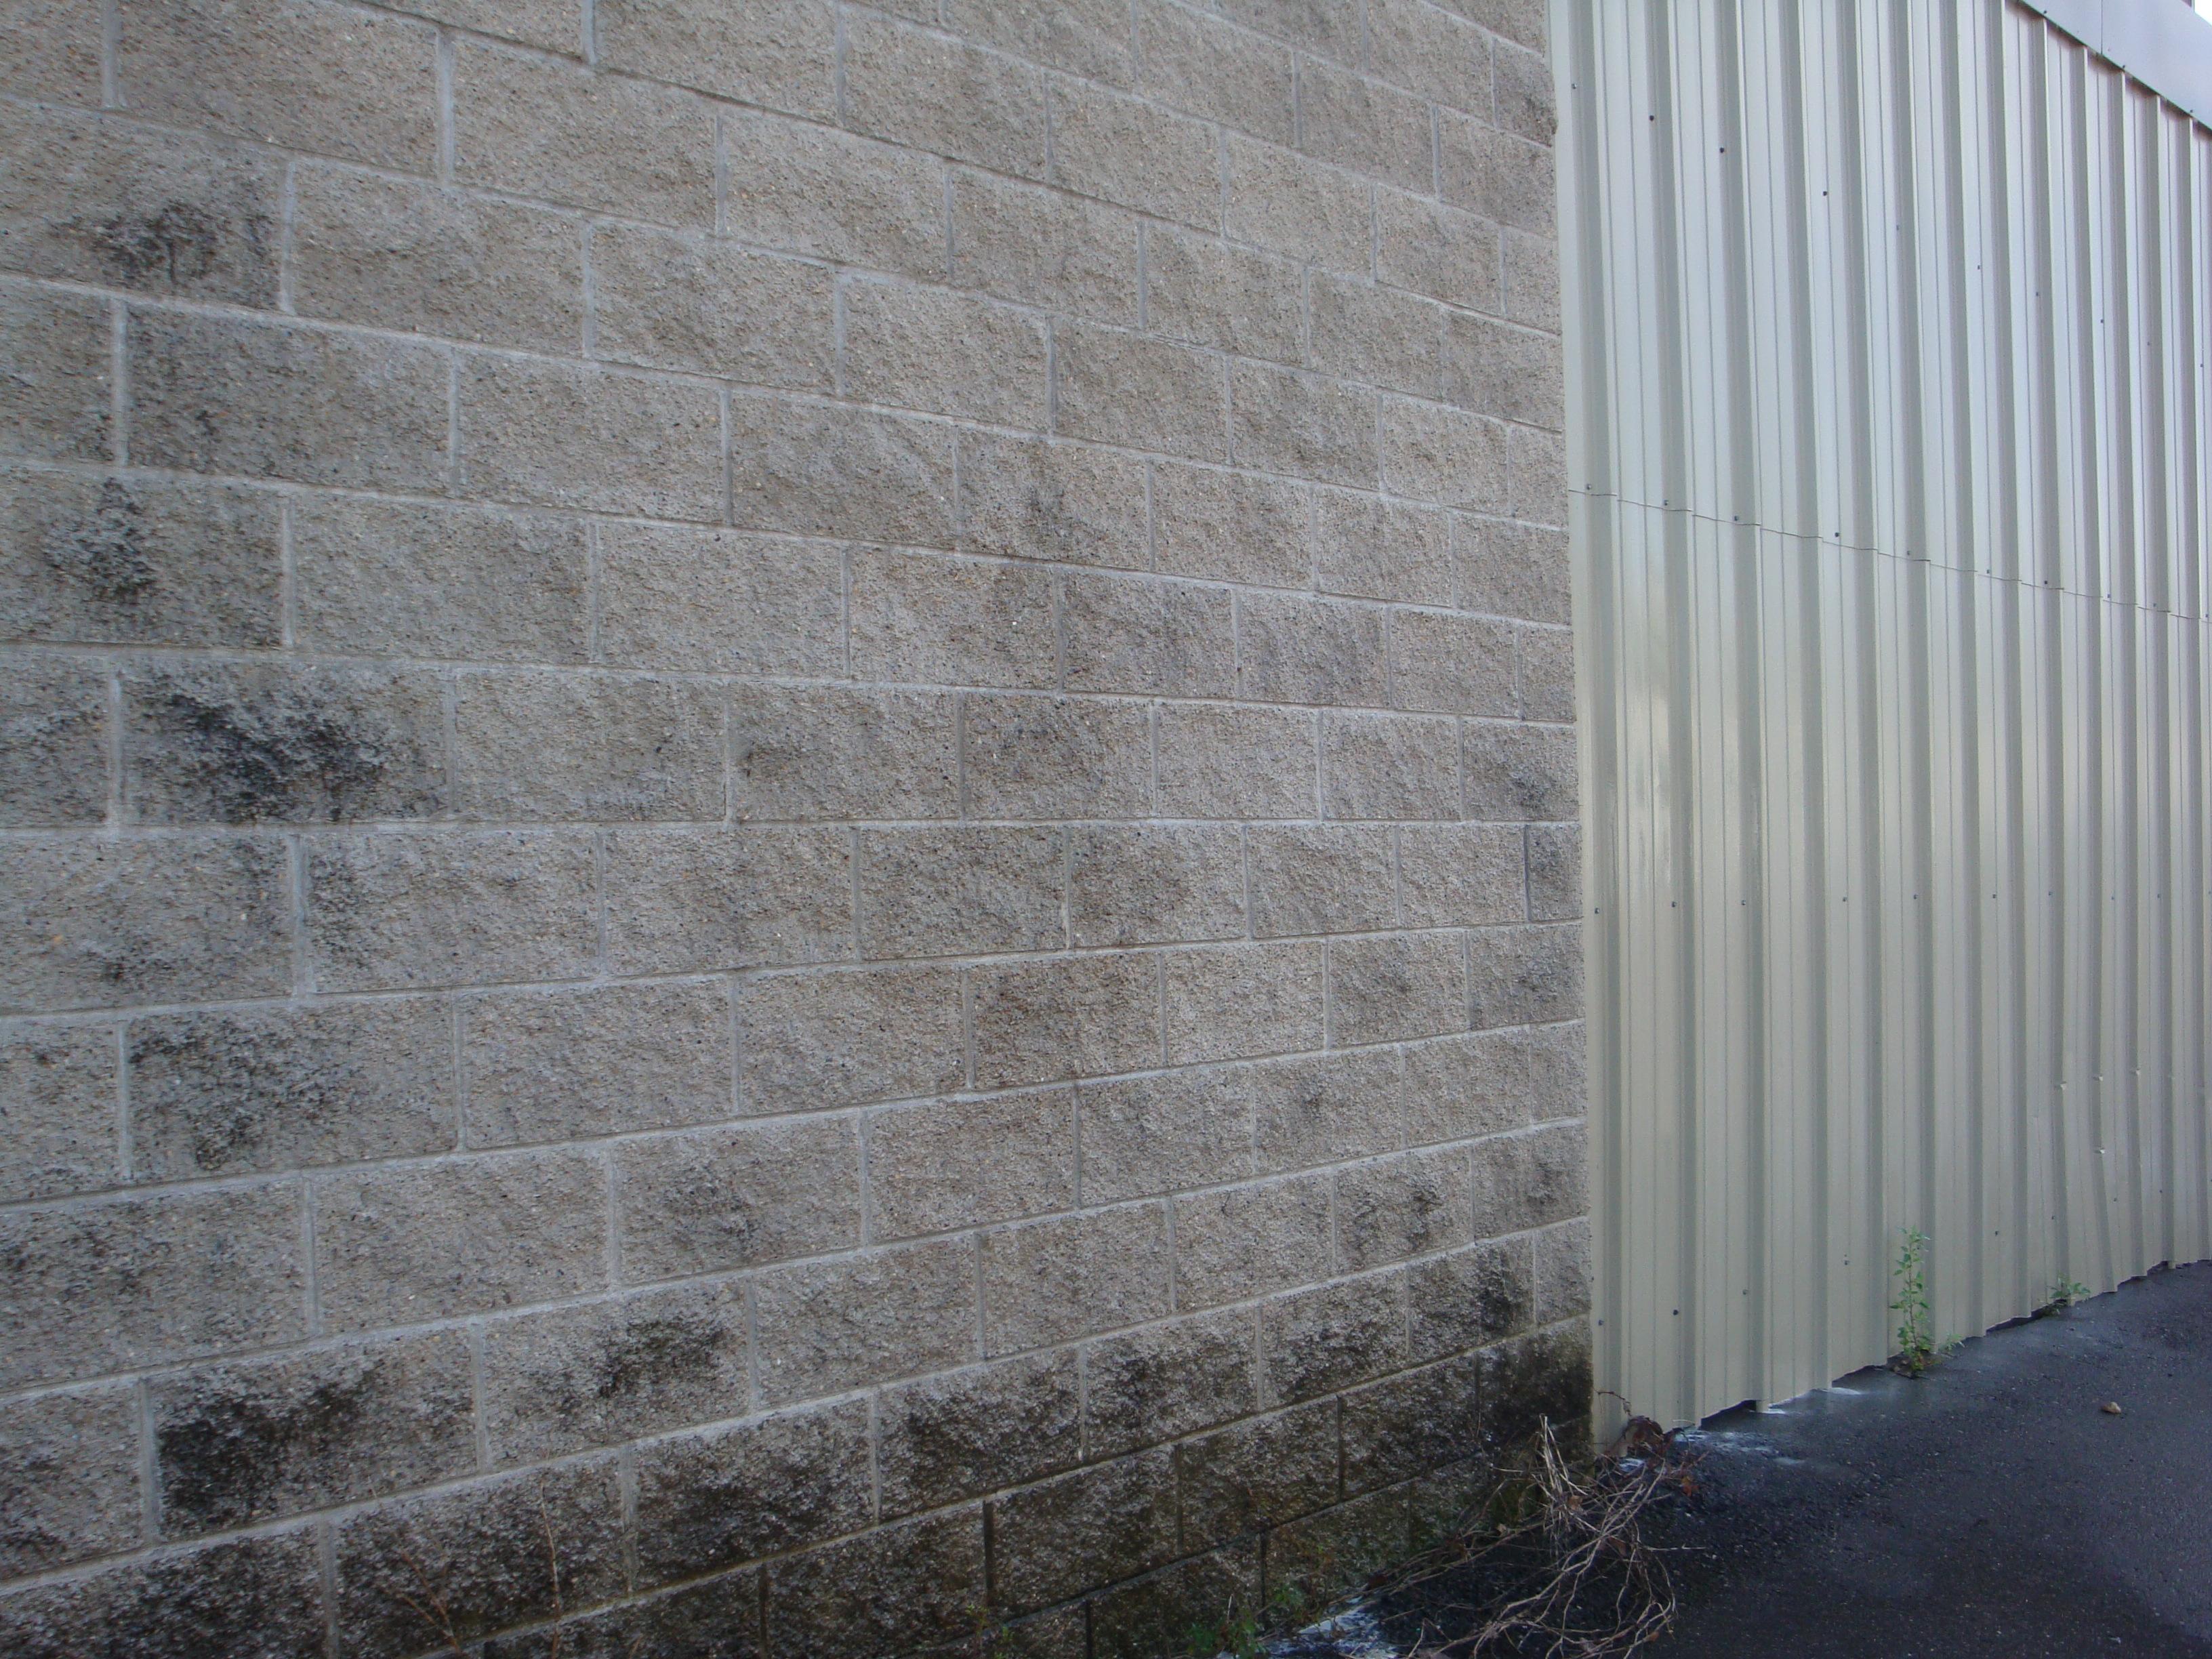 Elephant Snot - Split face cinder block - Apartment Building